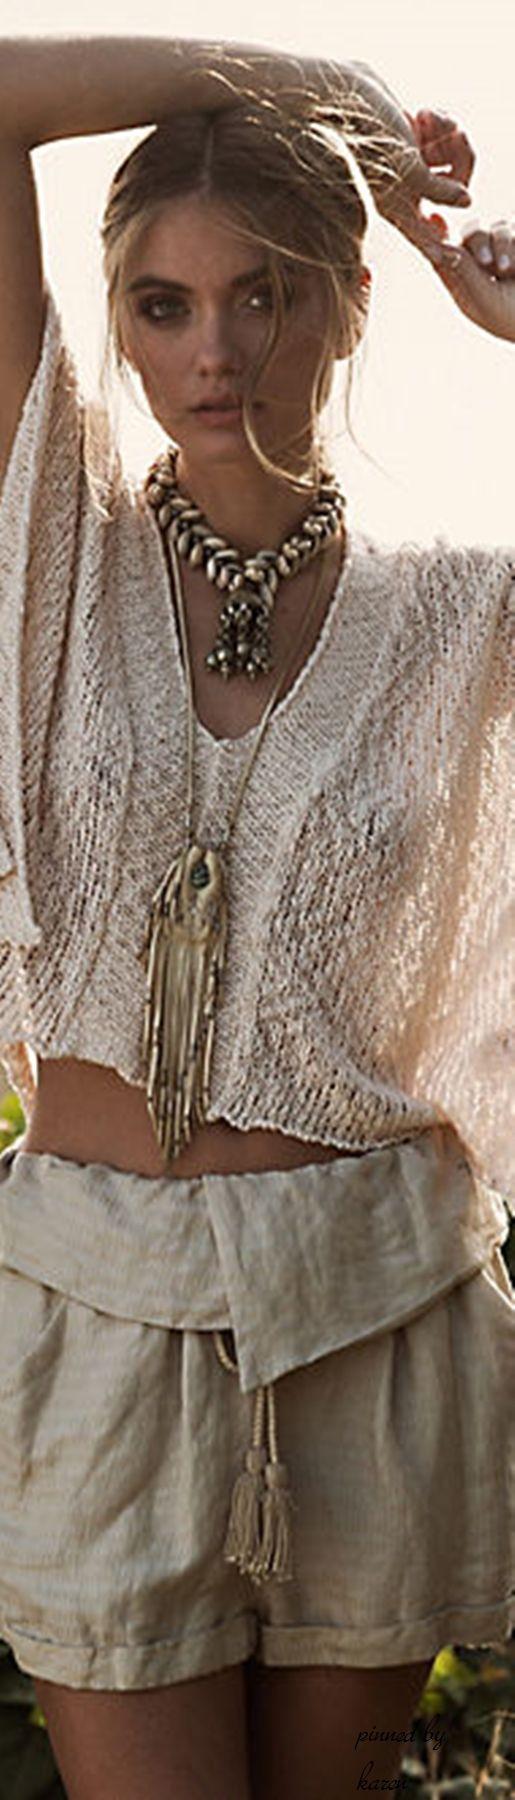 bohemian boho style hippy hippie chic bohème vibe gypsy fashion indie folk: